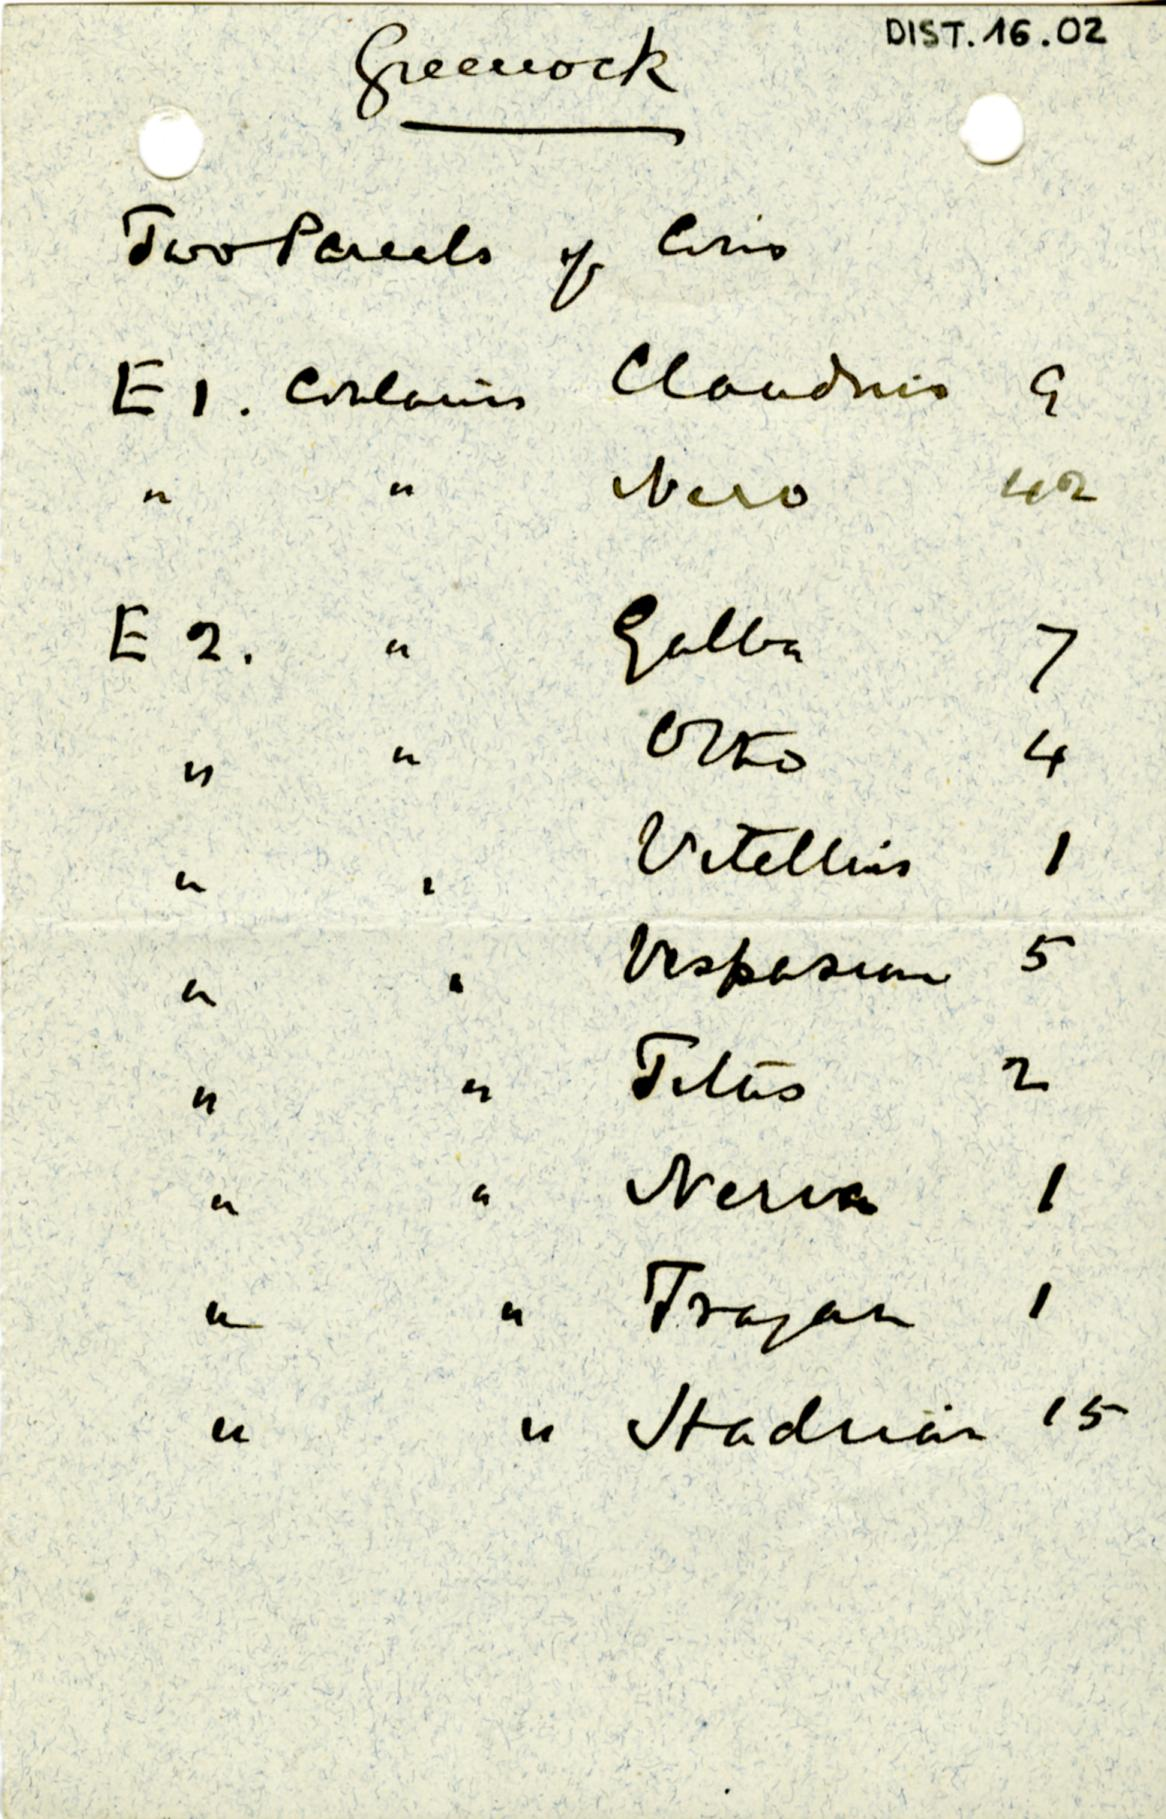 1896-1897 Oxyrhynchus DIST.16.02